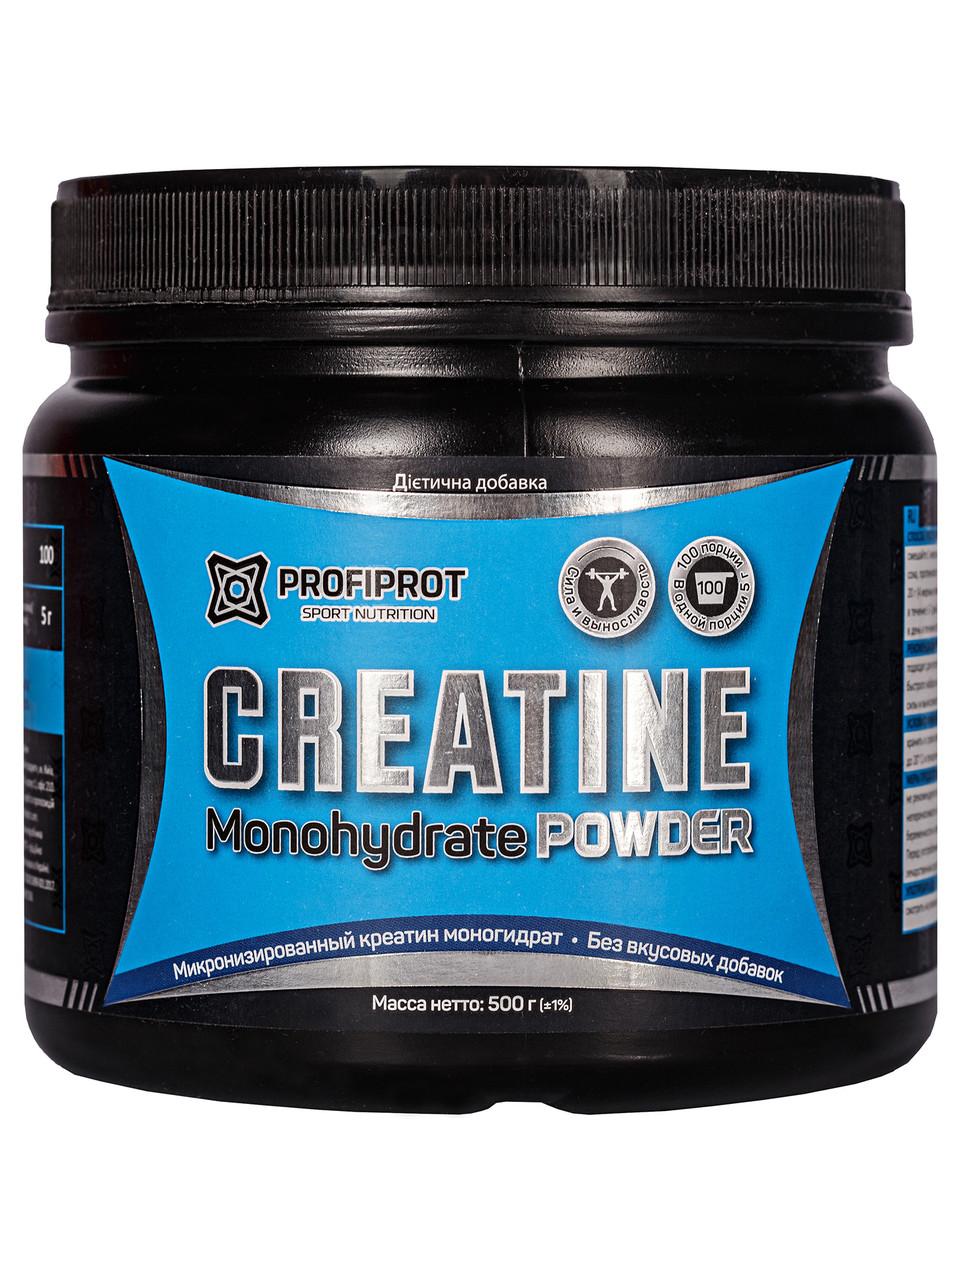 Креатин моногидрат Powder PROFIPROT 500 g